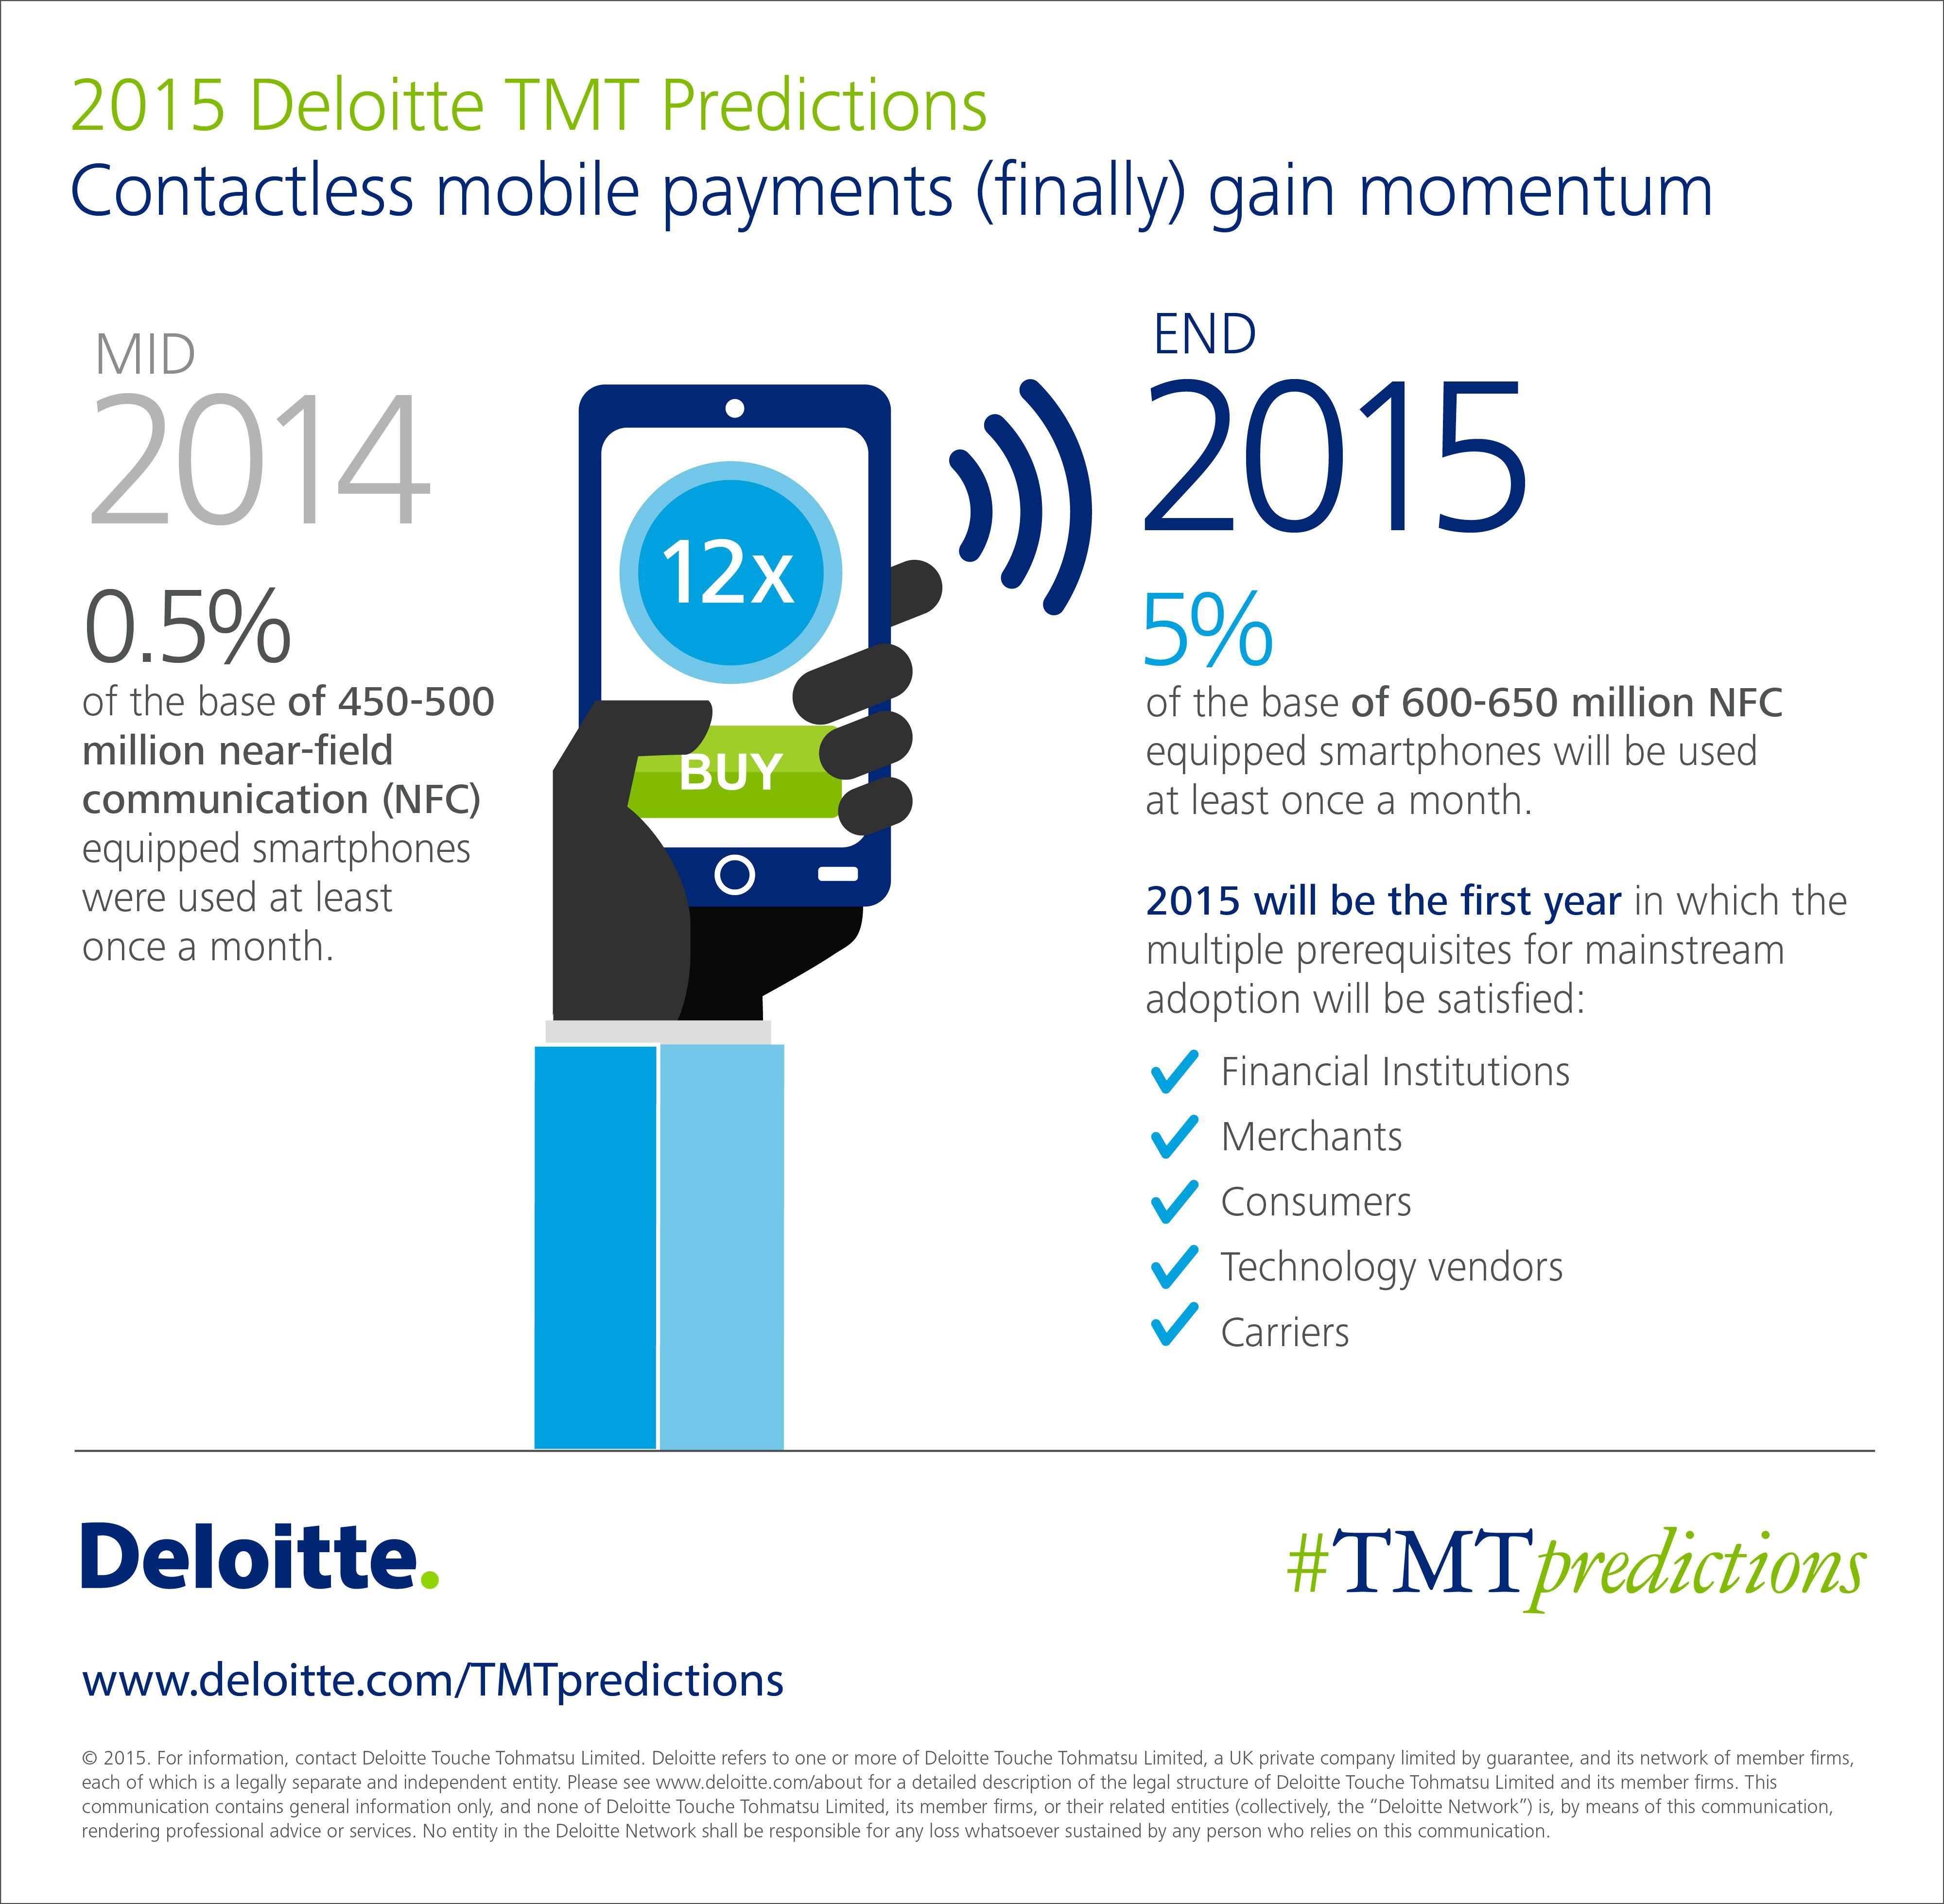 My work now online 2015 deloitte tmt predictions